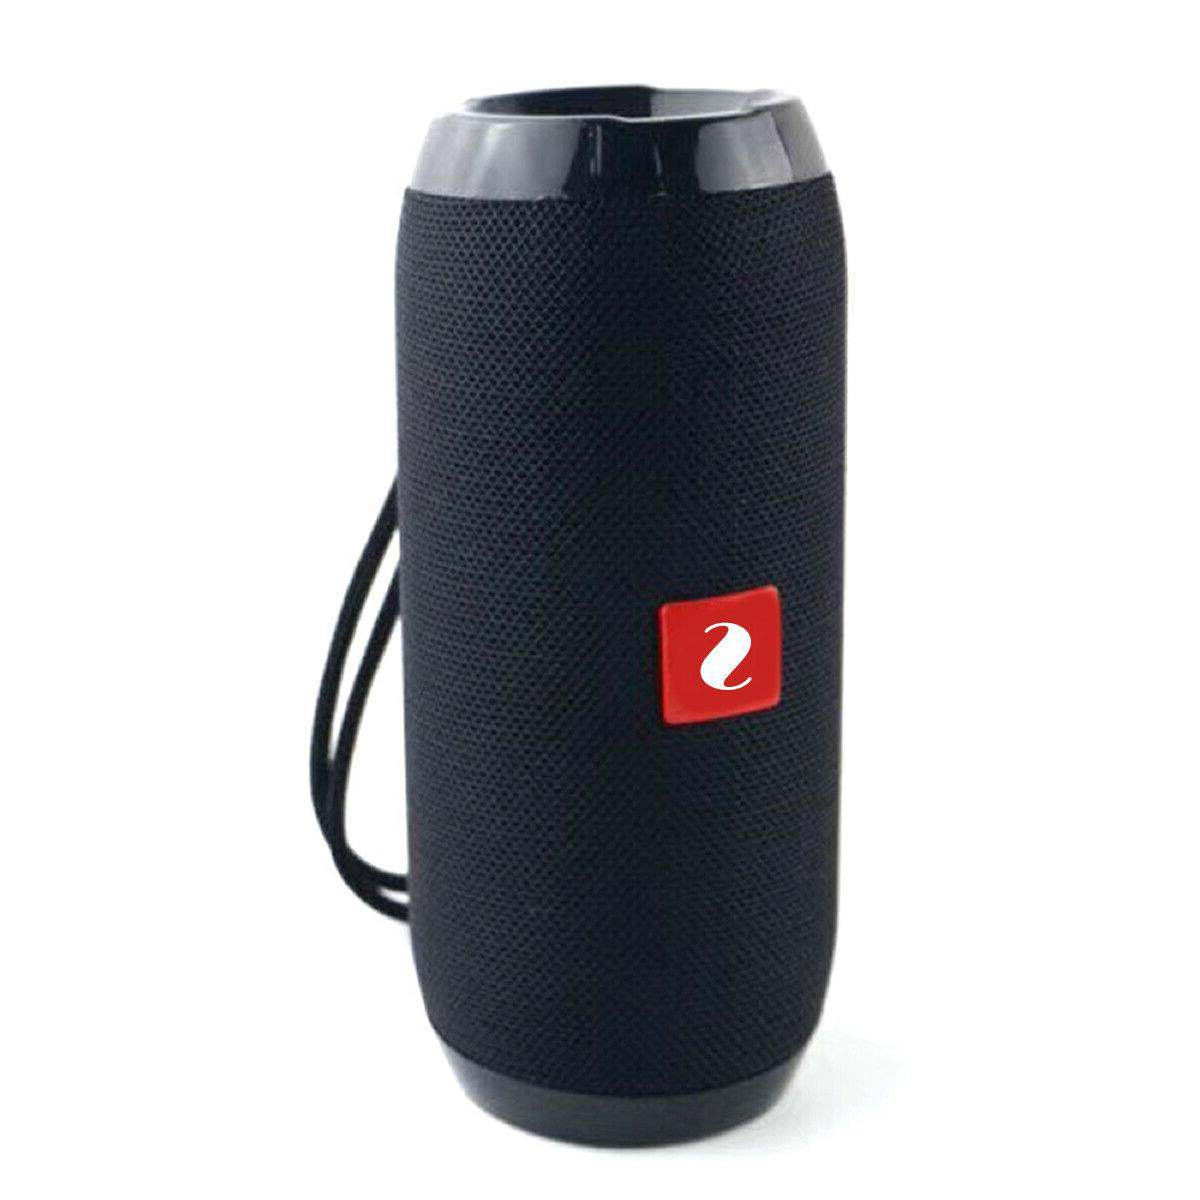 LOUD Bluetooth Waterproof USB/TF/MP3 Player